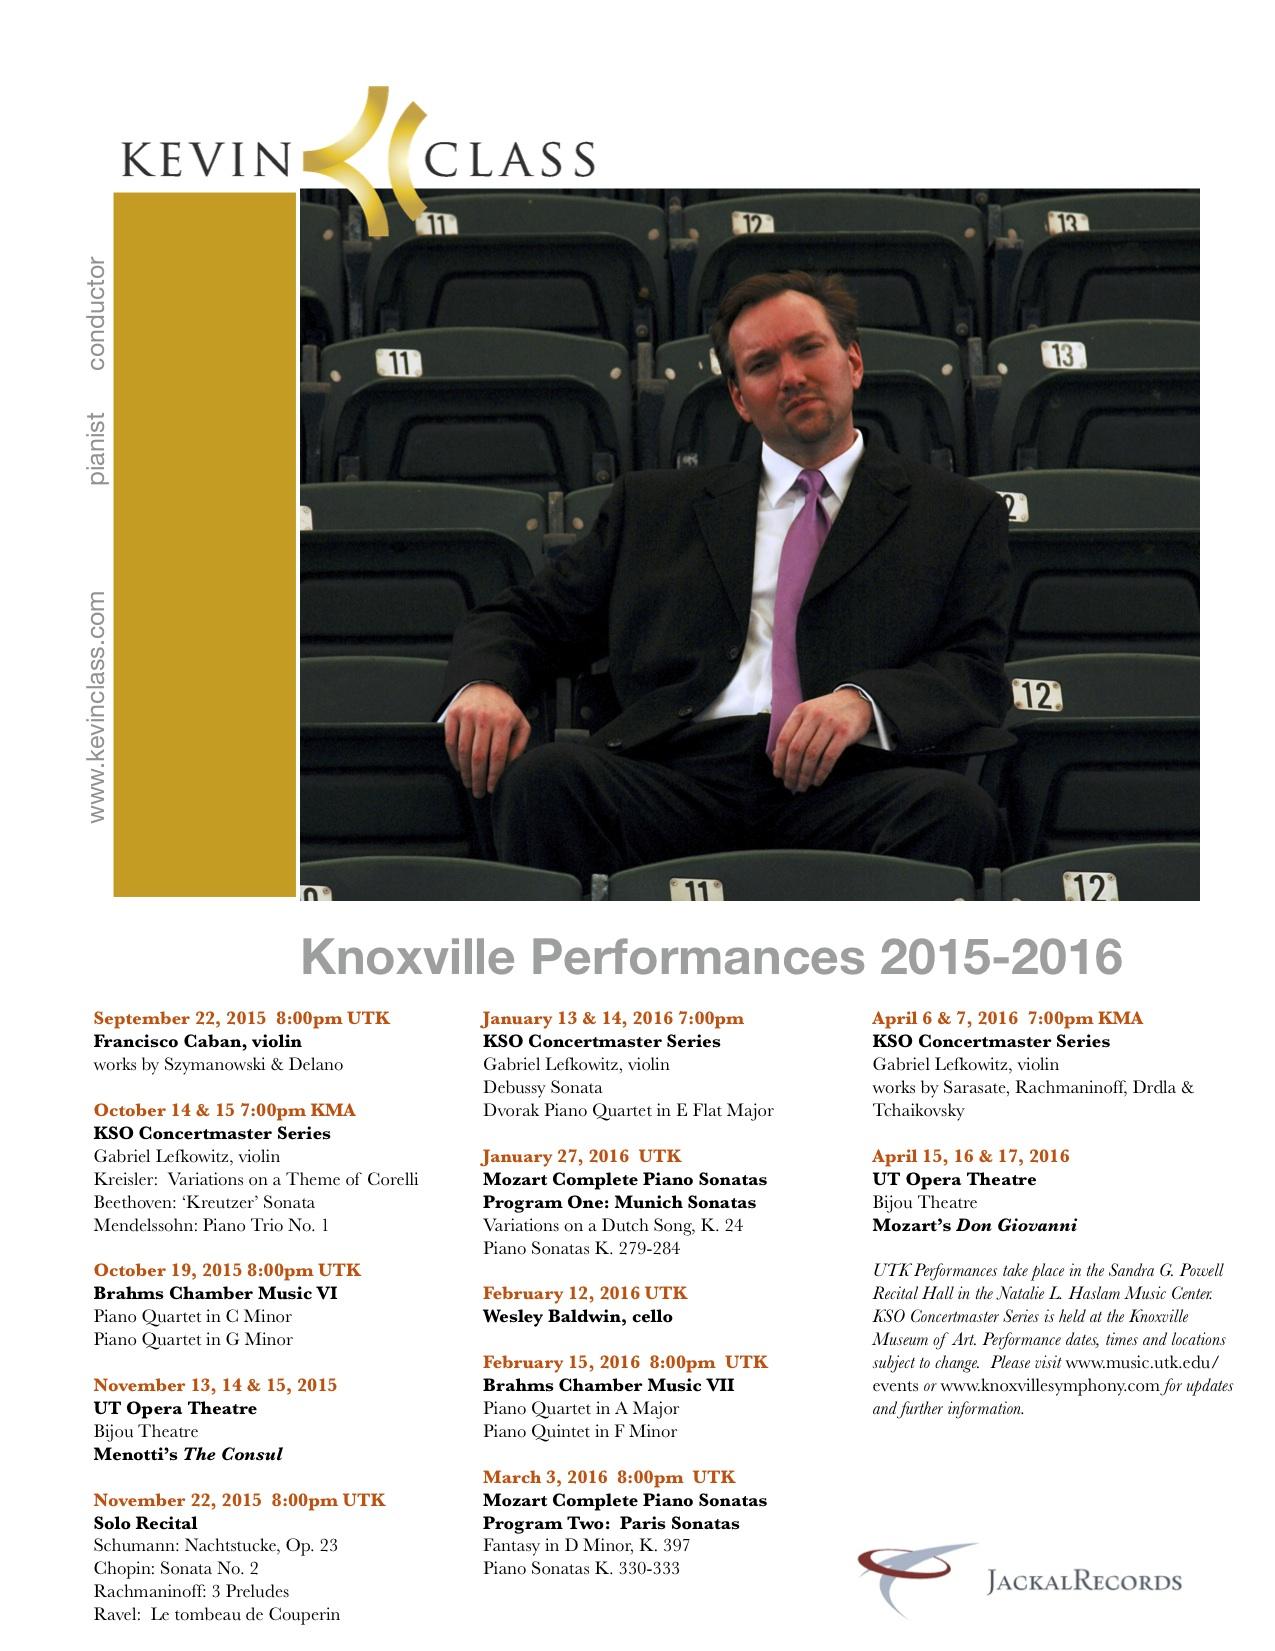 KCKnoxville2015:16jpg.jpg